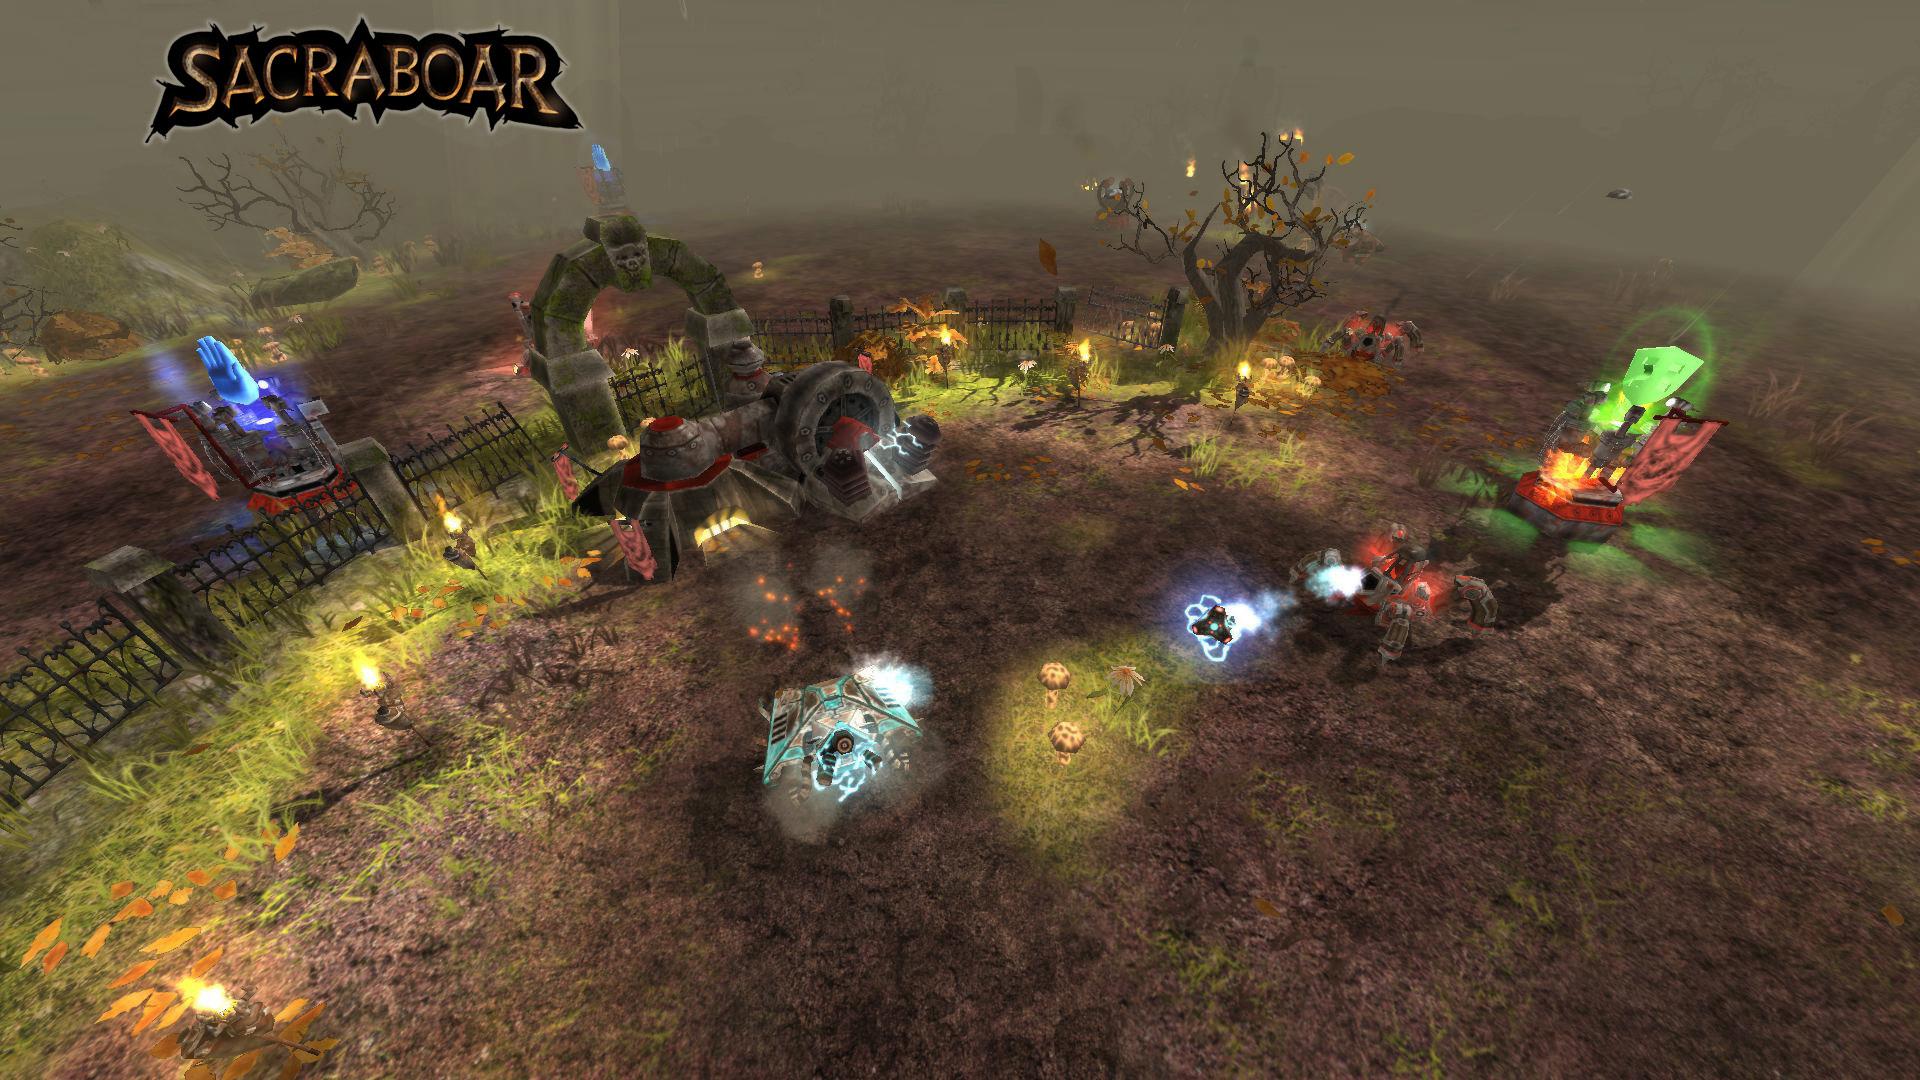 Sacraboar screenshot